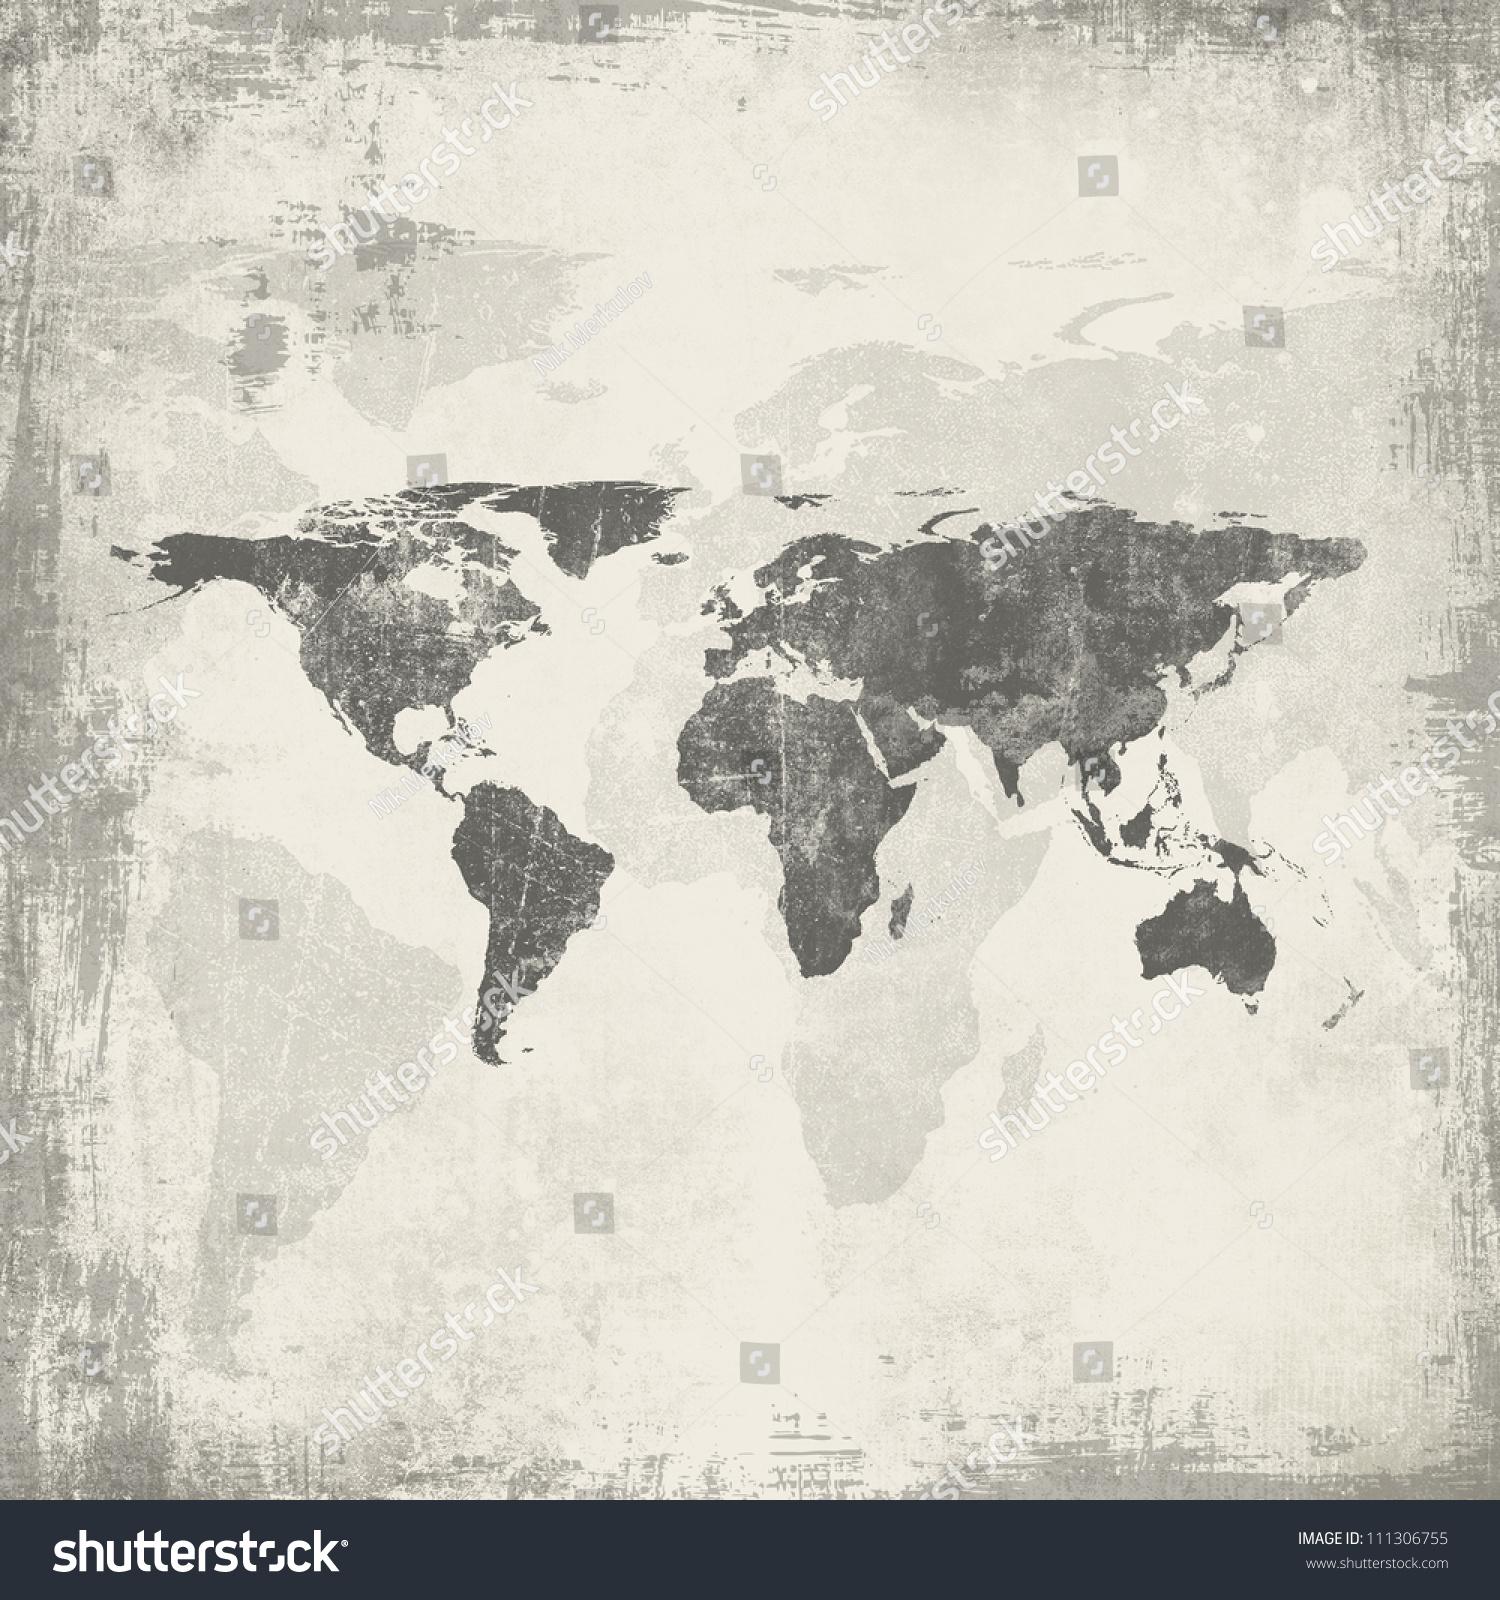 Grunge world map background stock illustration 111306755 shutterstock grunge world map background gumiabroncs Gallery